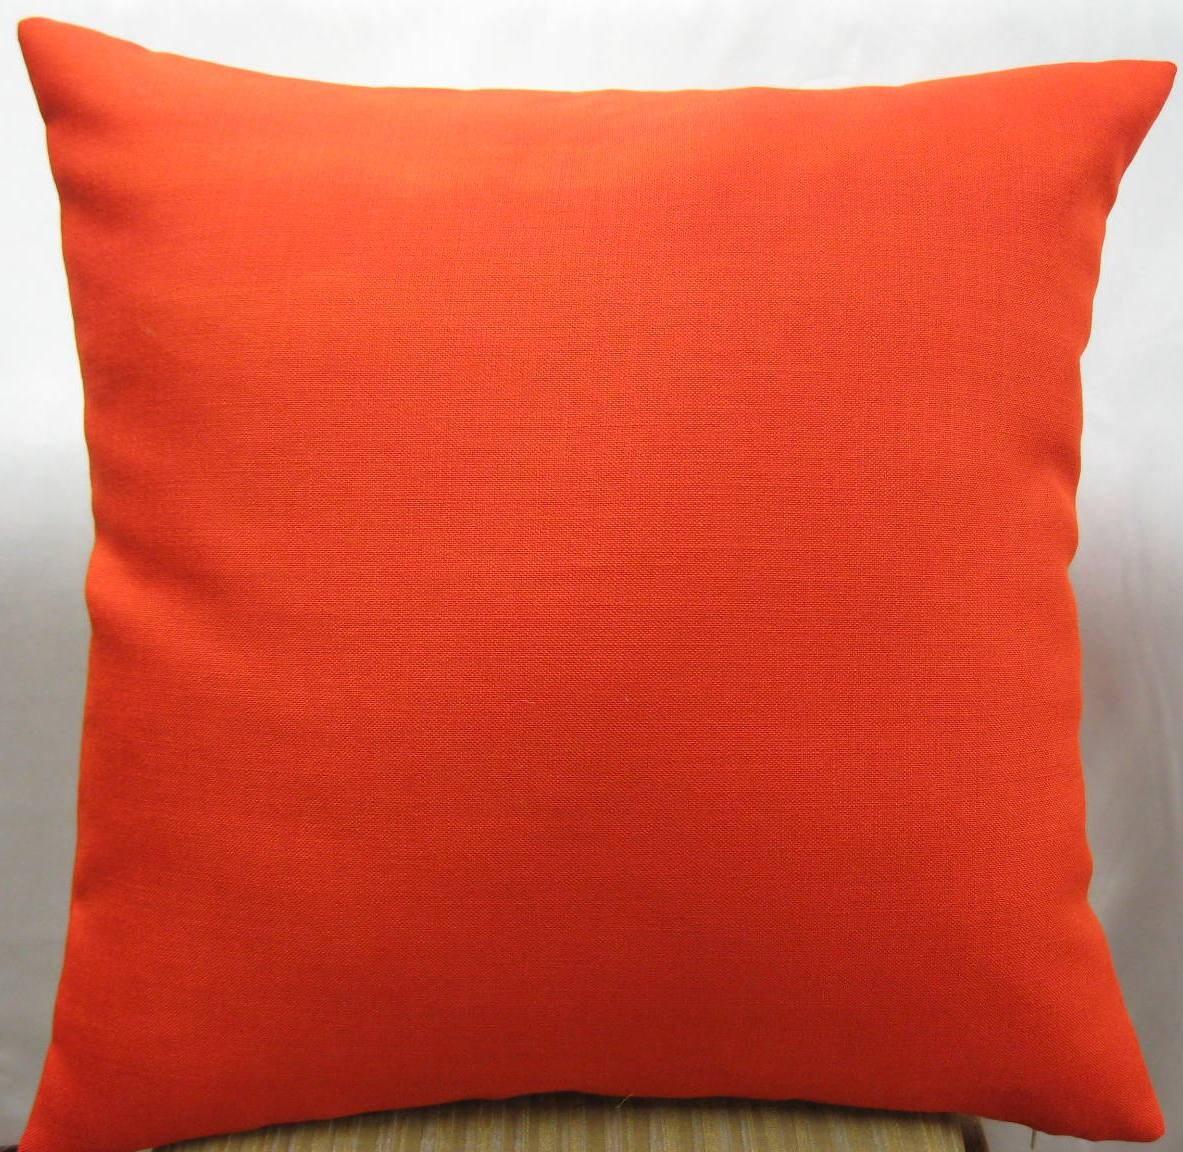 Dark Orange Decorative Pillows : Dark orange pillow cover in 24 x 24 linen fabric by pillowusa